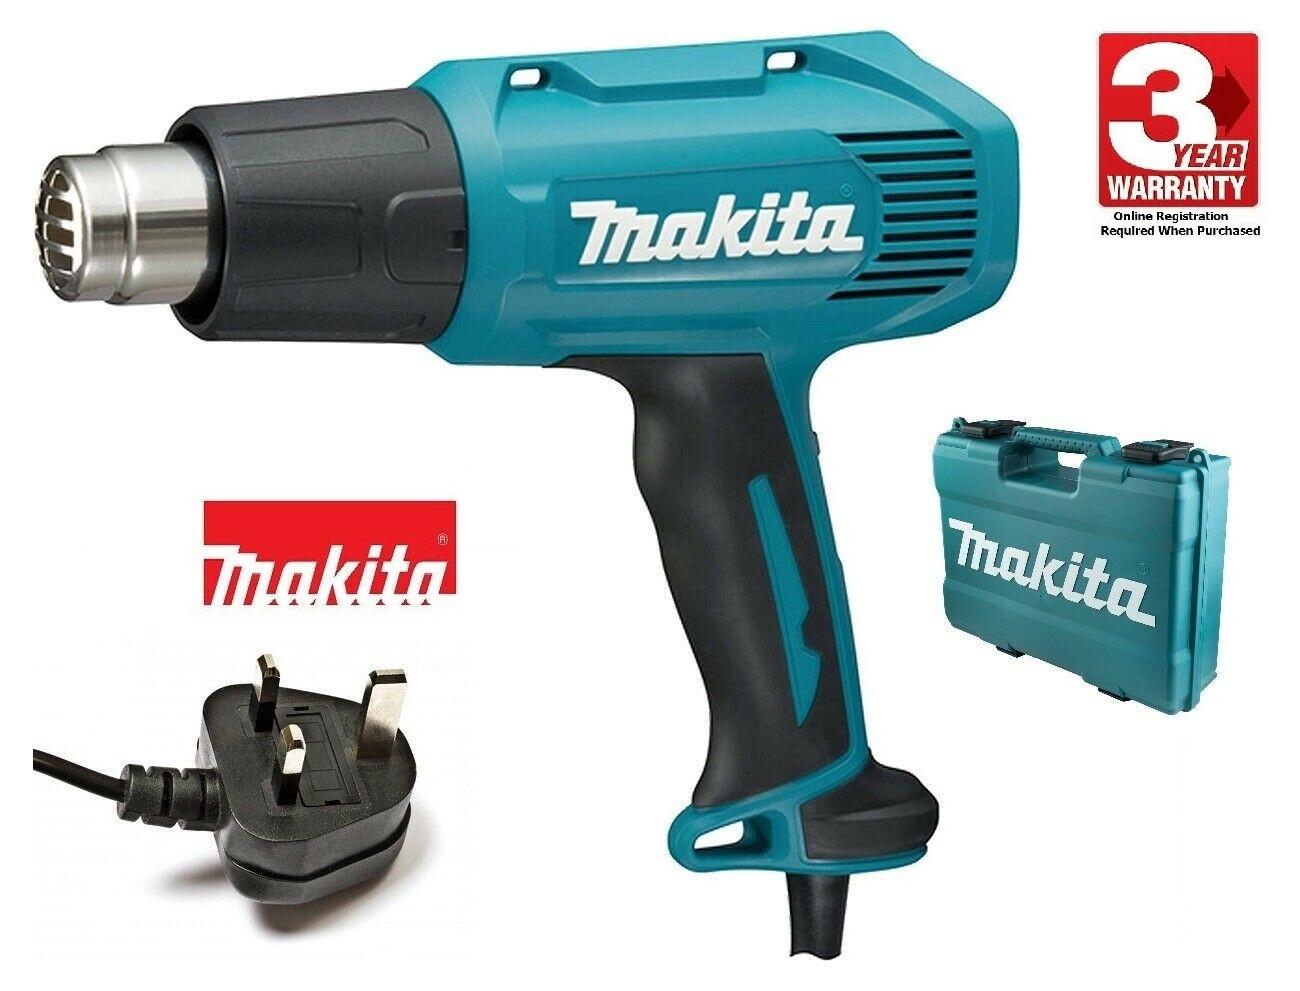 Makita Professional Heat Gun 550c HG5030K 1600W | Its ergonomic soft grip provides increased comfort during prolonged use. | toolforce.ie